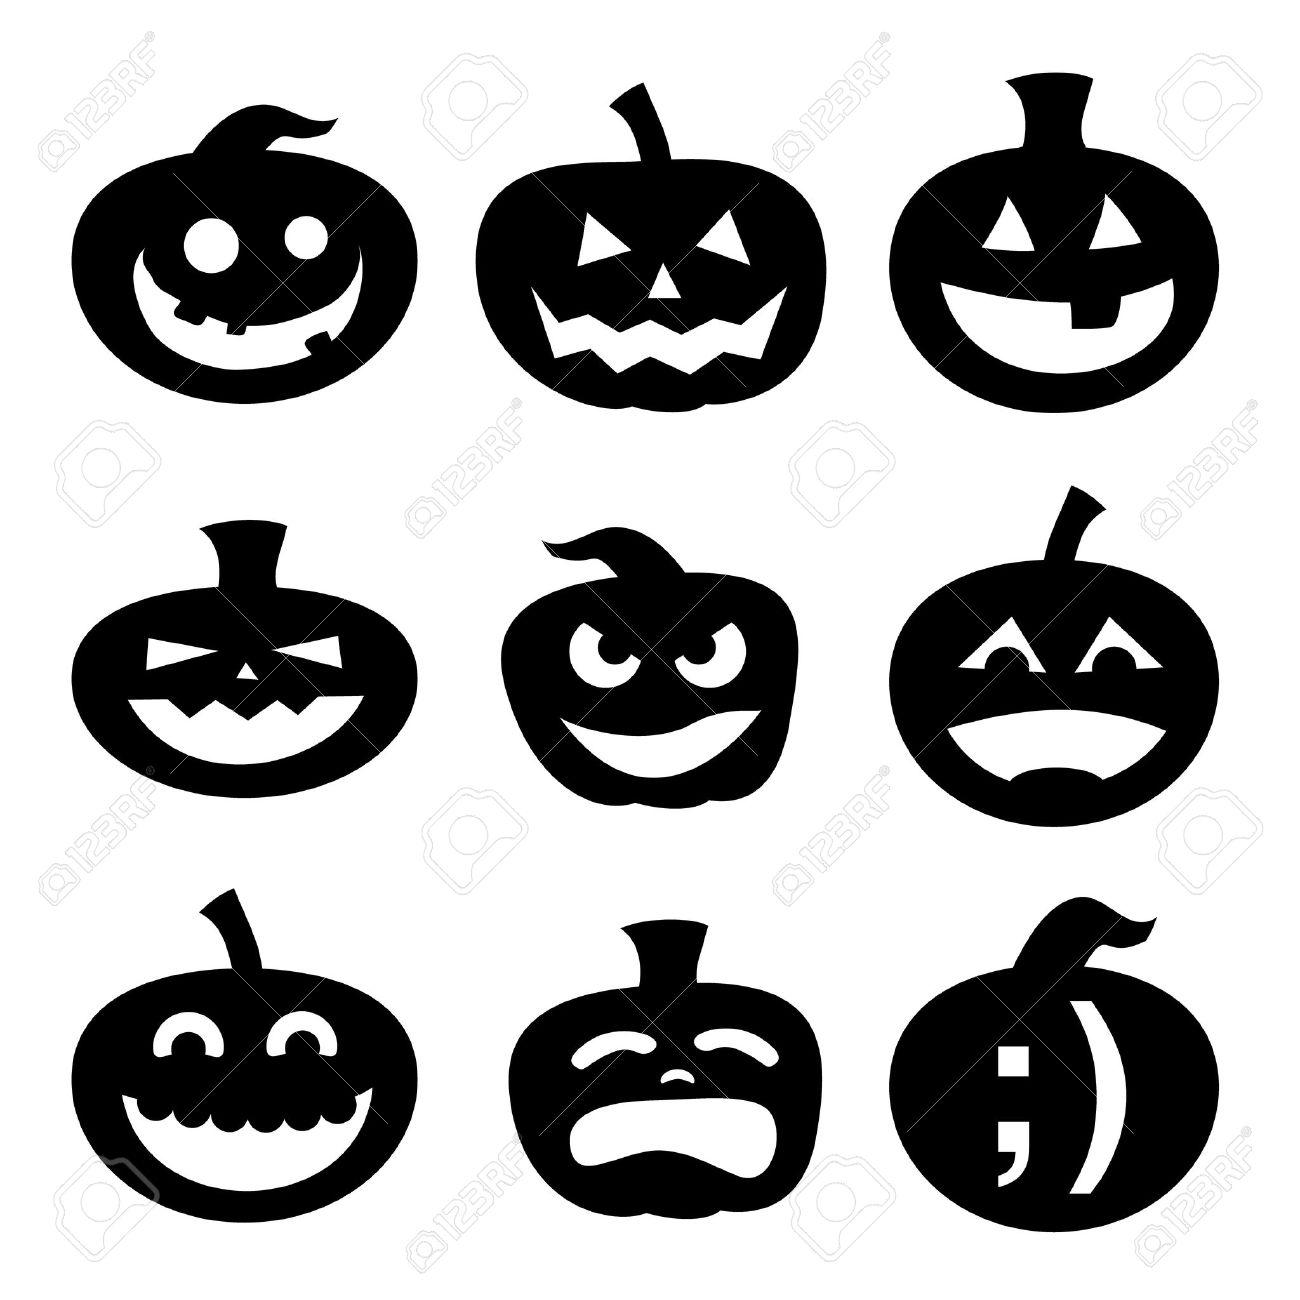 Halloween decoration clipart - Halloween Decoration Jack